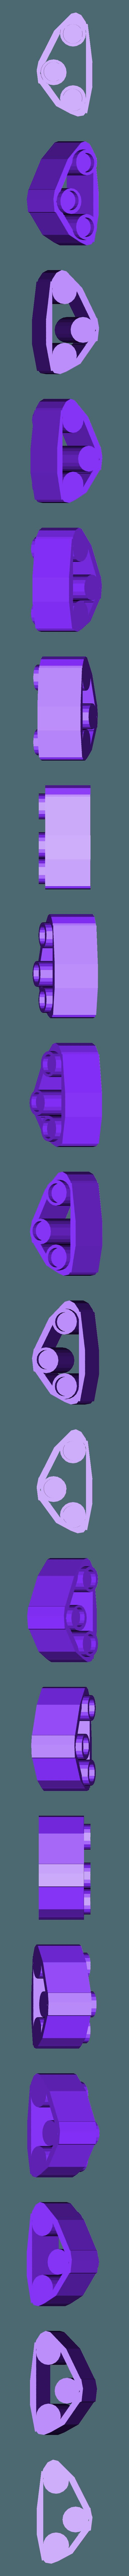 Three_Pulley_Belt.stl Download free STL file Gaslands Greebles (Blowers and Burners) • Design to 3D print, Ellie_Valkyrie